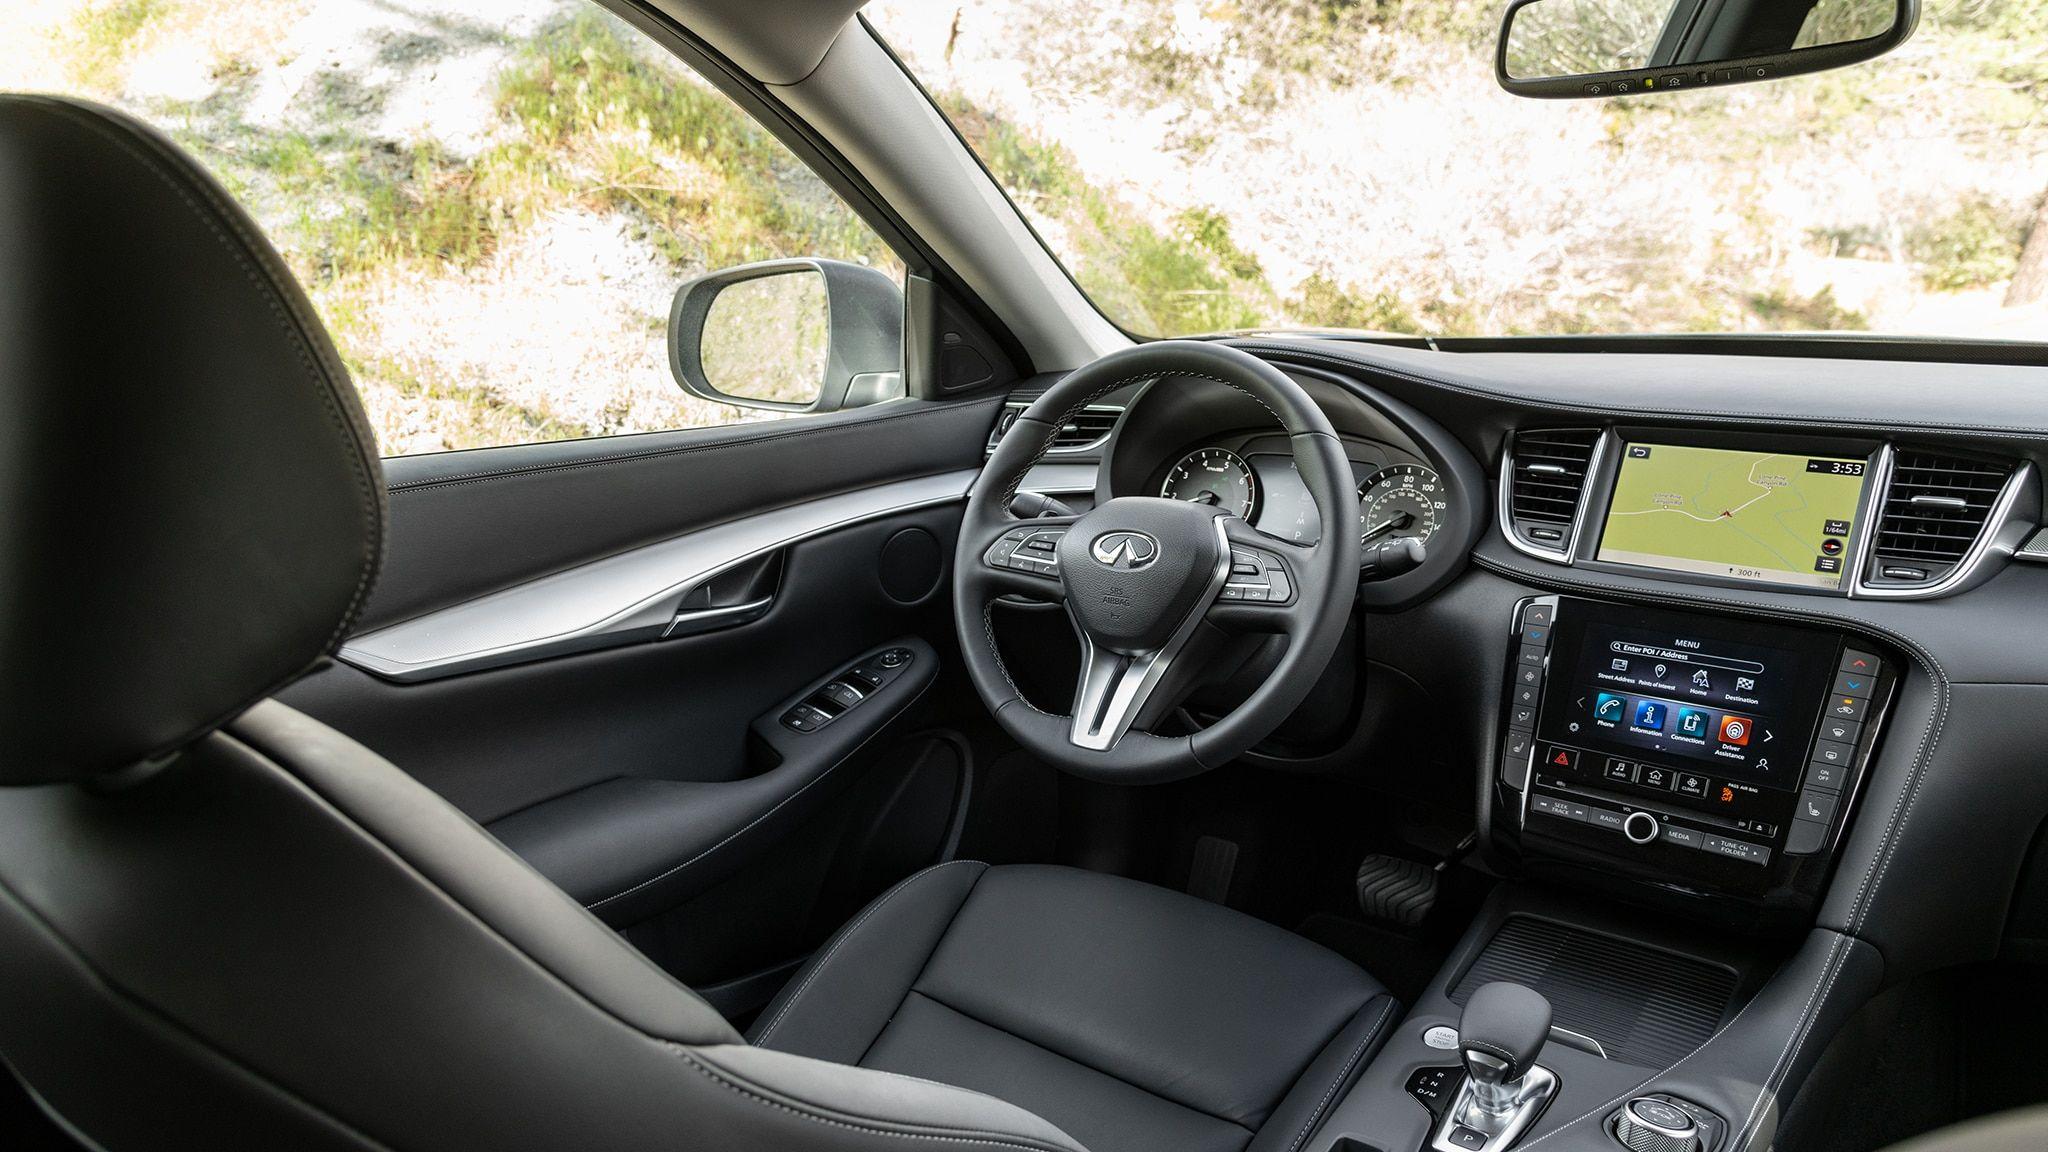 2020 Infiniti Qx50 Luxe Interior Review In 2020 Infiniti Luxe Interiors Infinity Qx